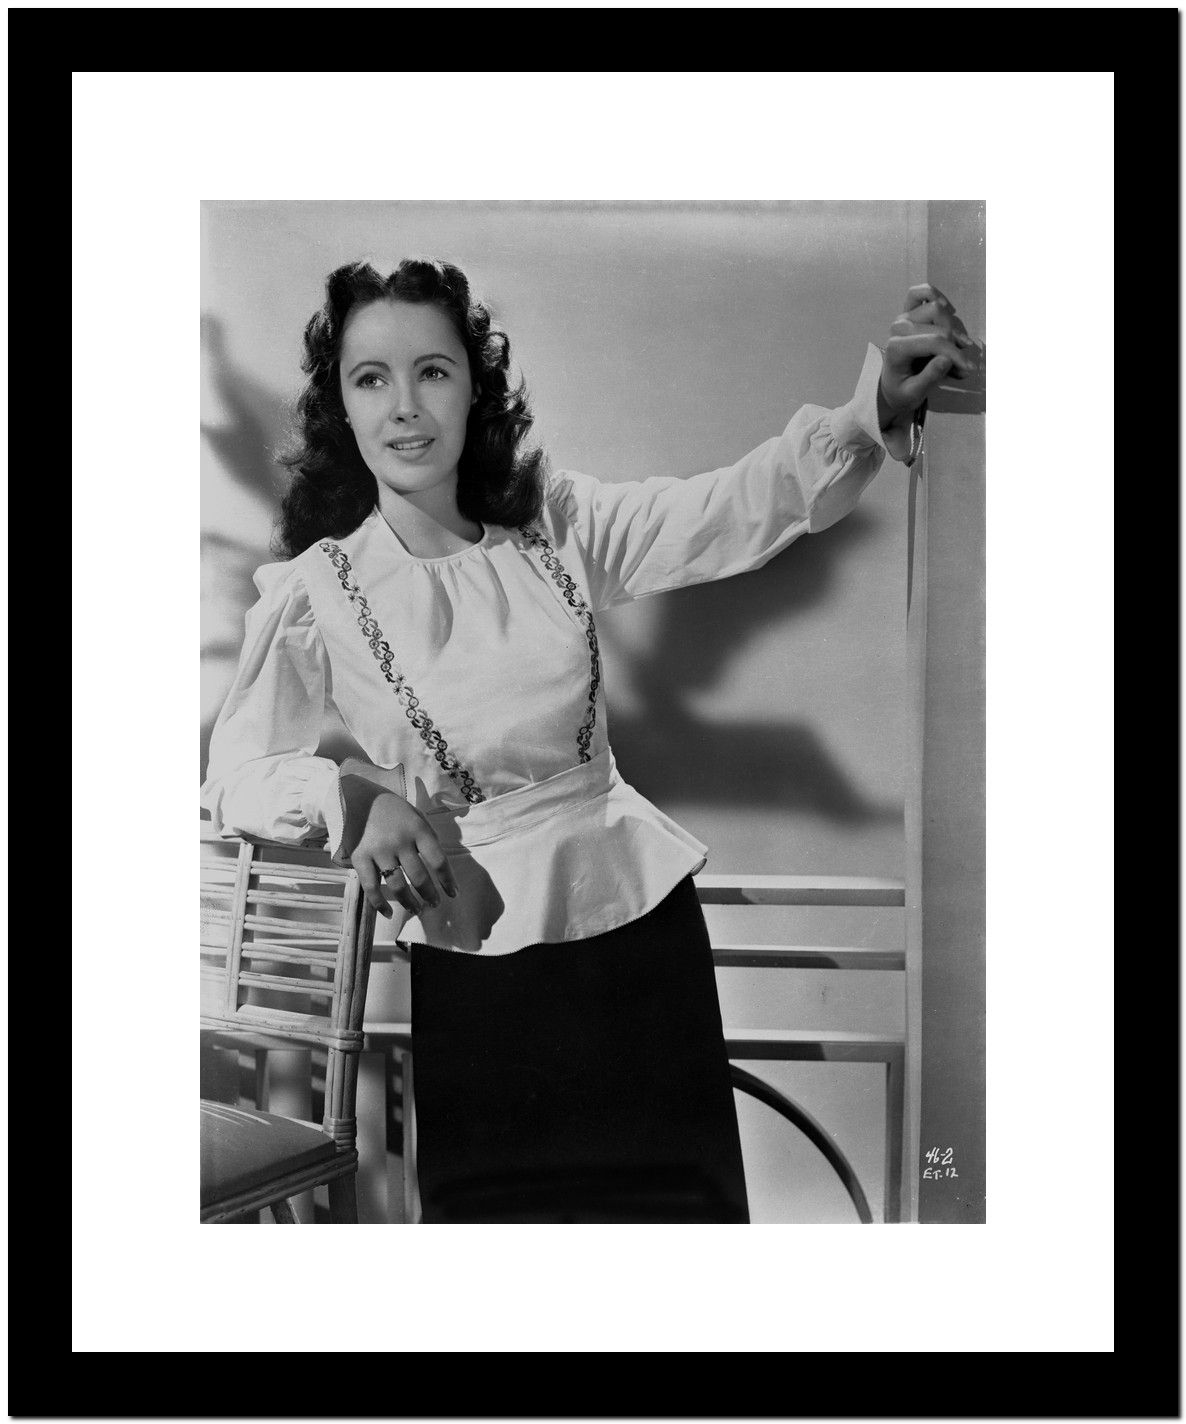 Elizabeth Taylor Leaning Pose in Classic Portrait Premium Art Print